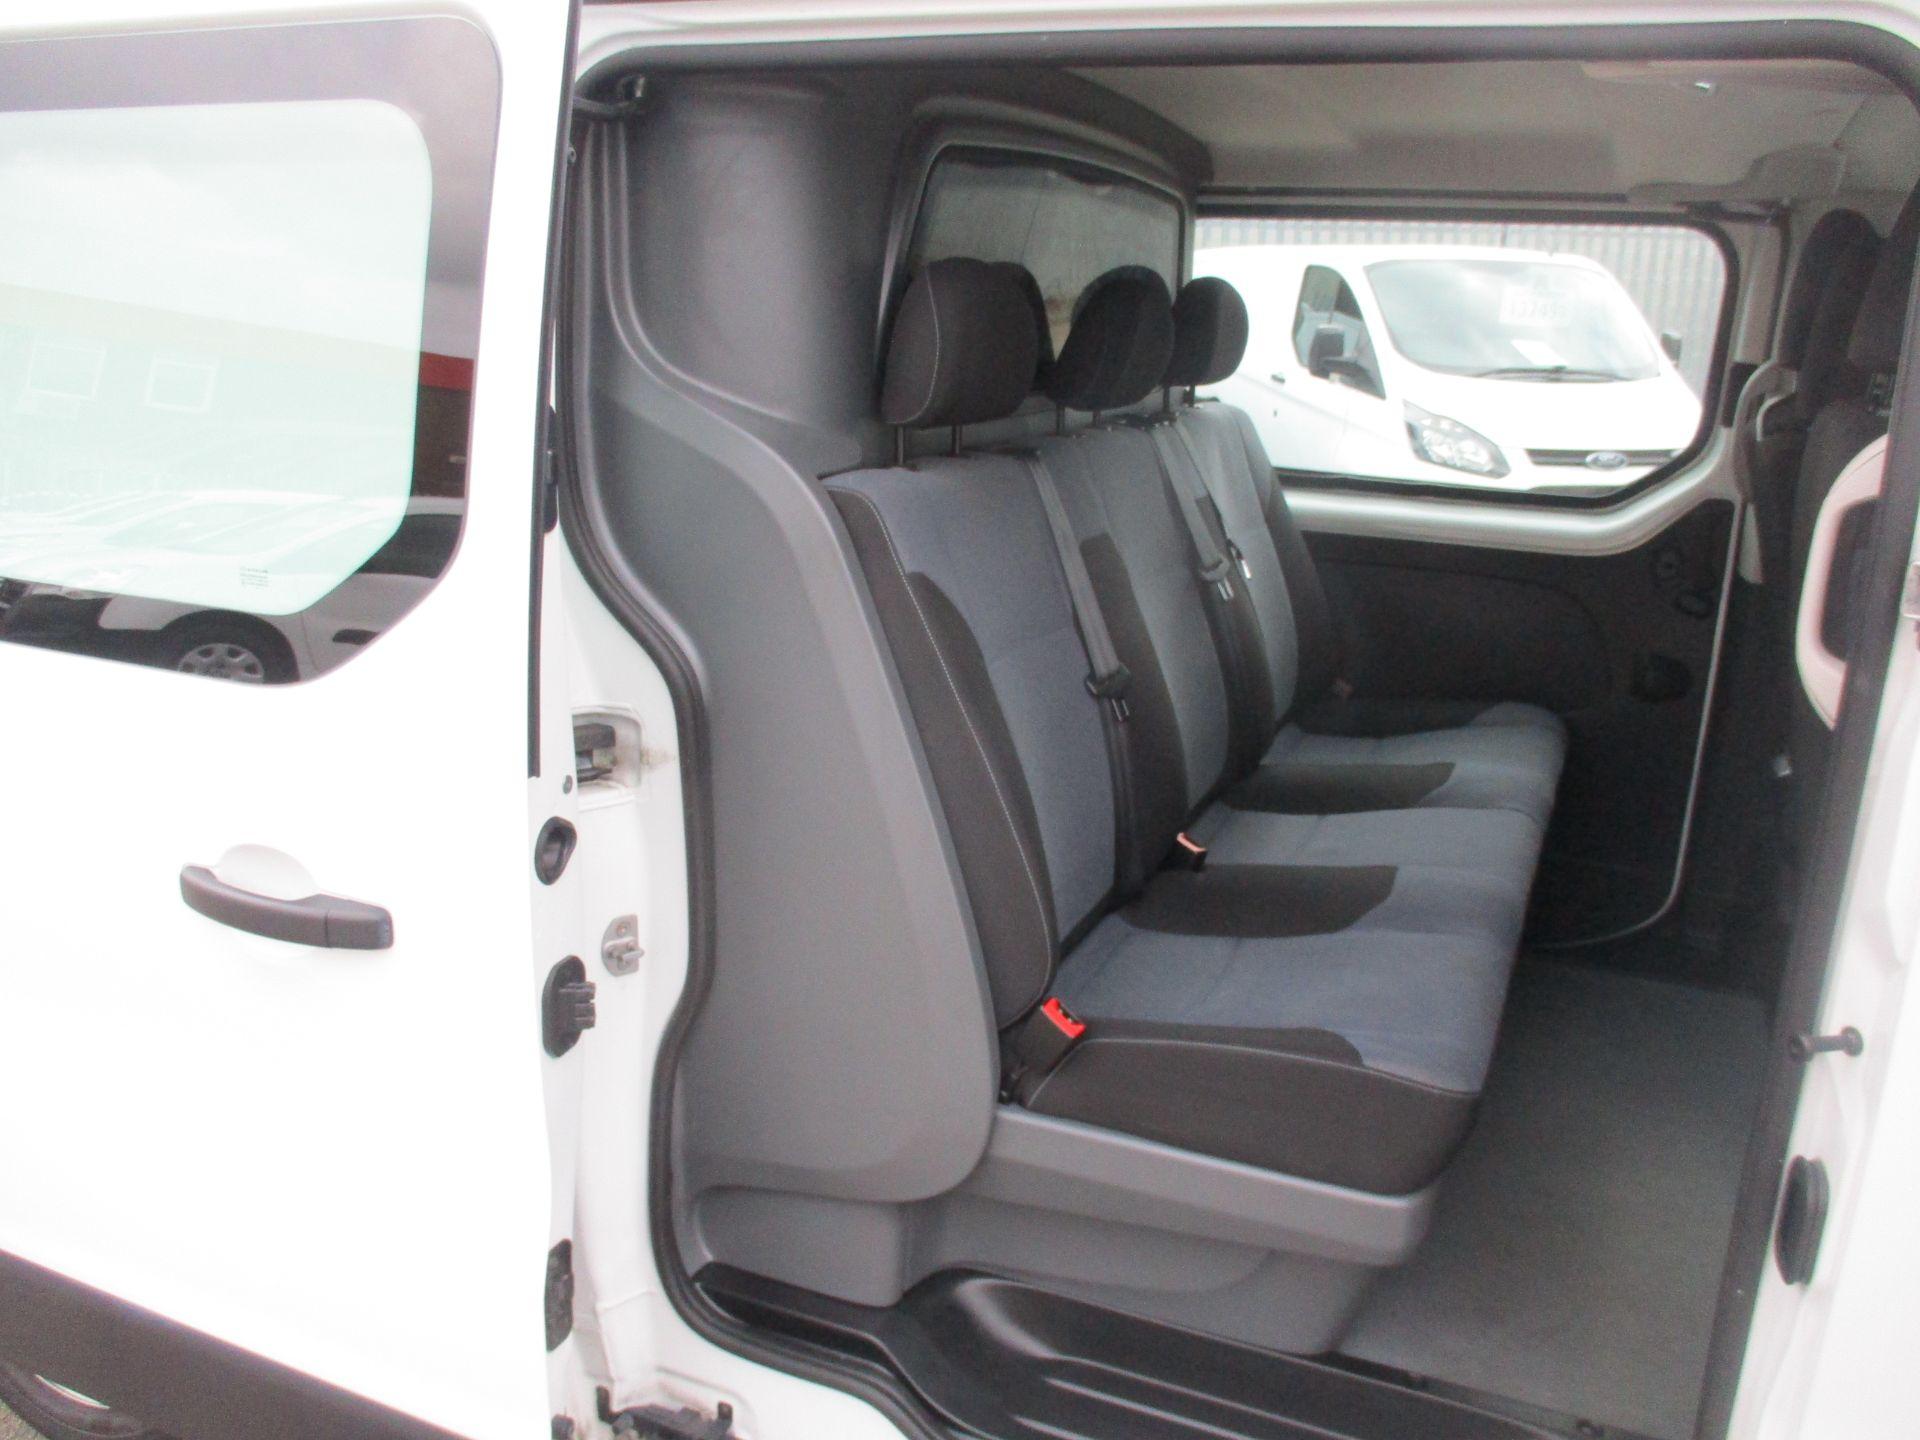 2017 Vauxhall Vivaro L2 H1 2900 1.6CDTI 120PS DOUBLE CAB  EURO 6 (DY67MYF) Image 3